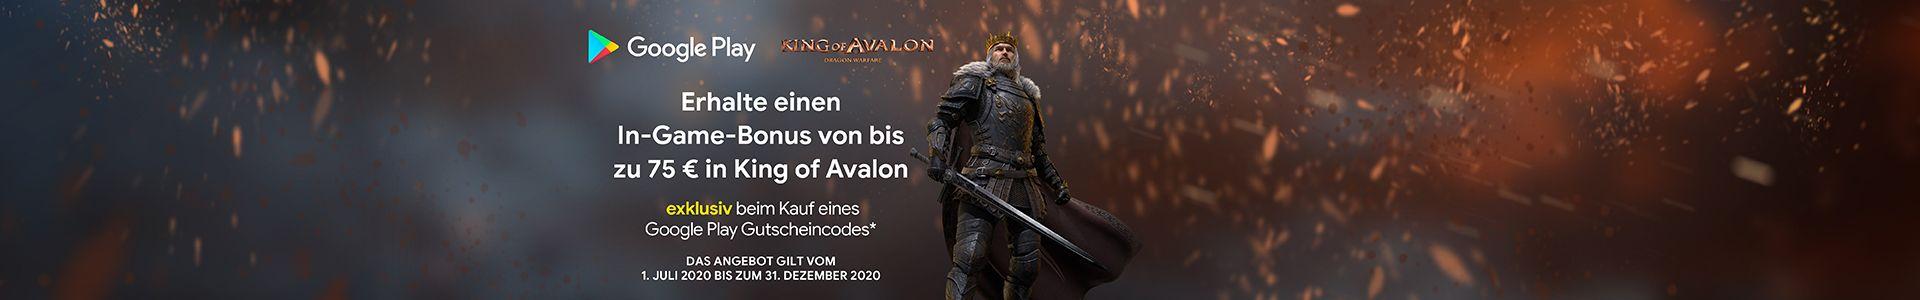 GooglePlay_King_of_Avalon_promo